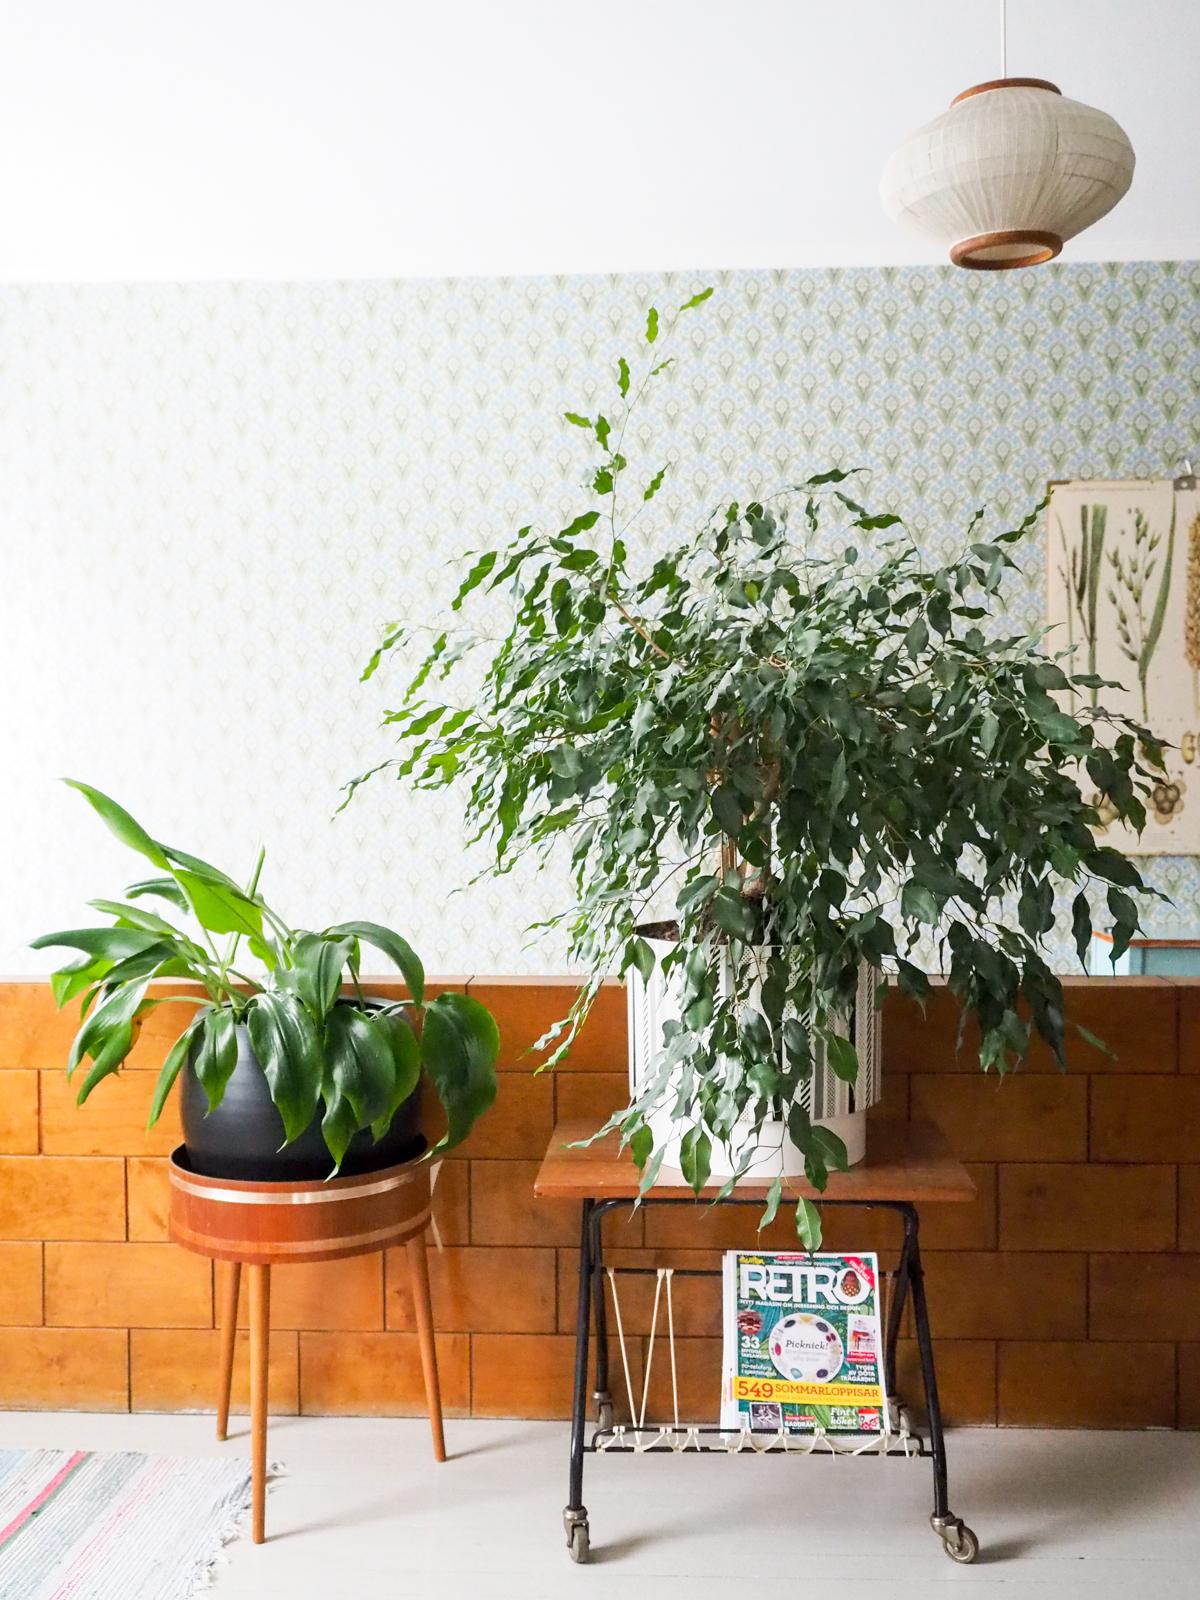 vanha limoviikuna, amatsoninlija, viherkasvi